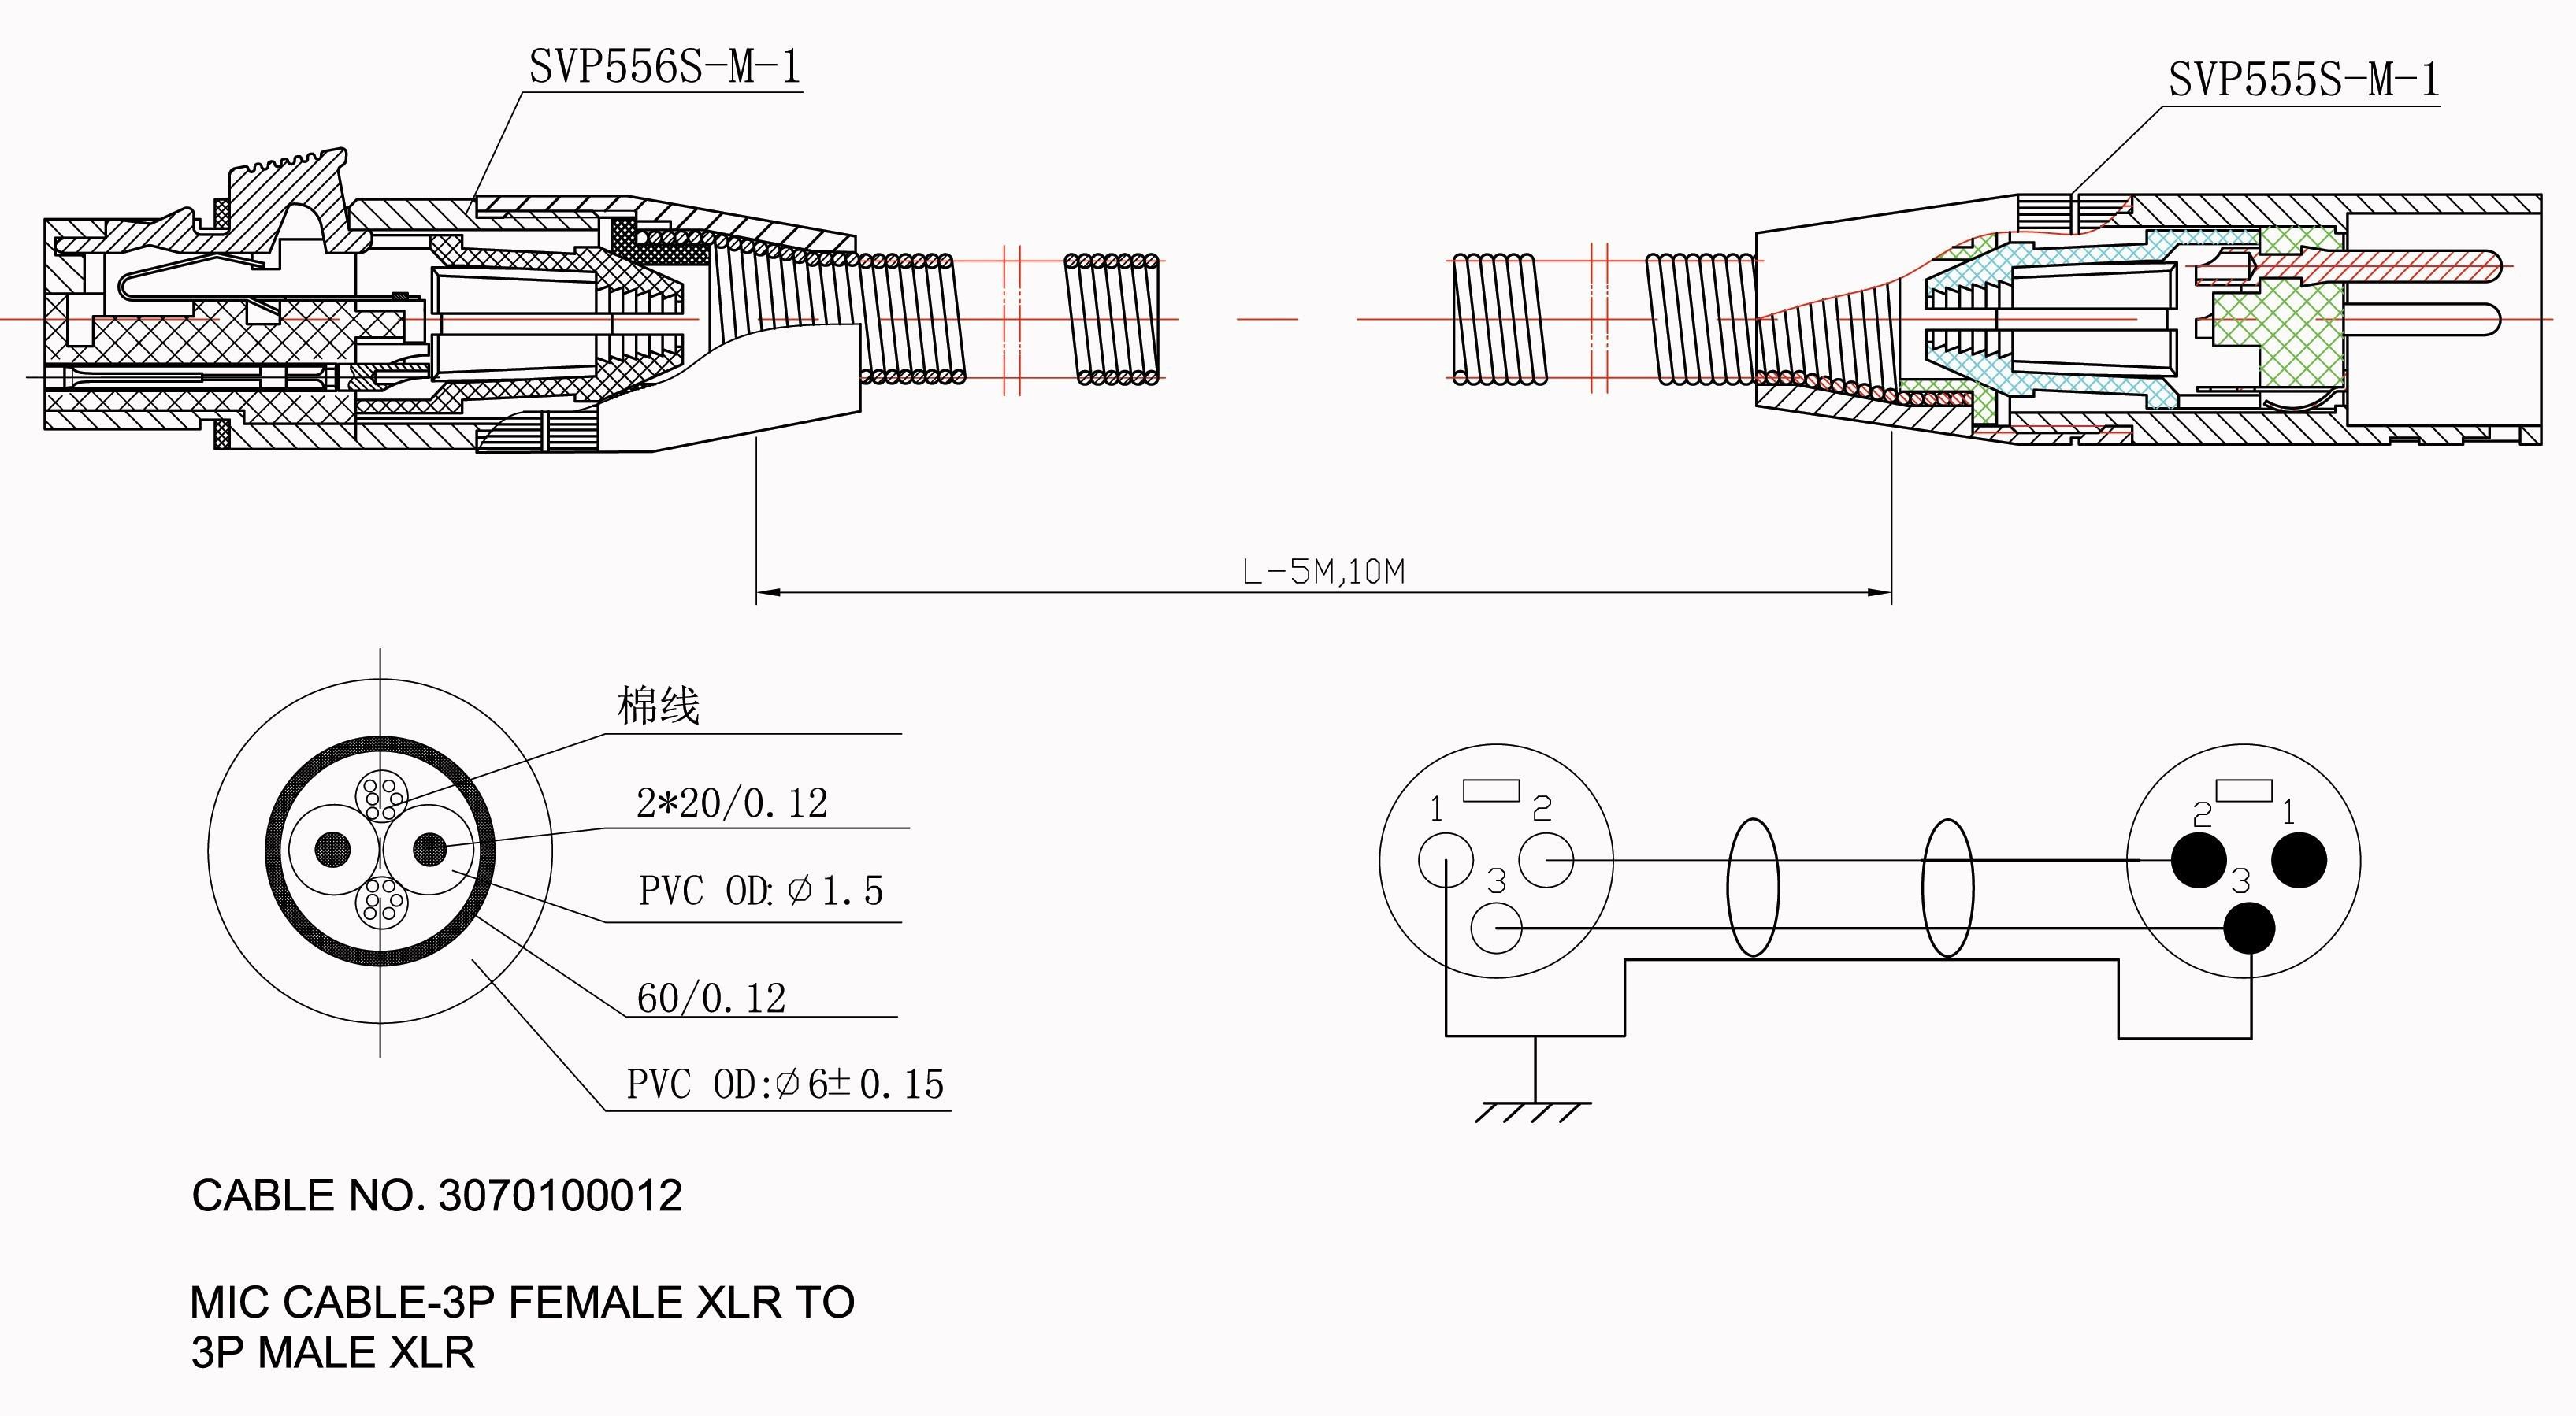 Motorguide Trolling Motor Wiring Diagram Elegant | Wiring ... on